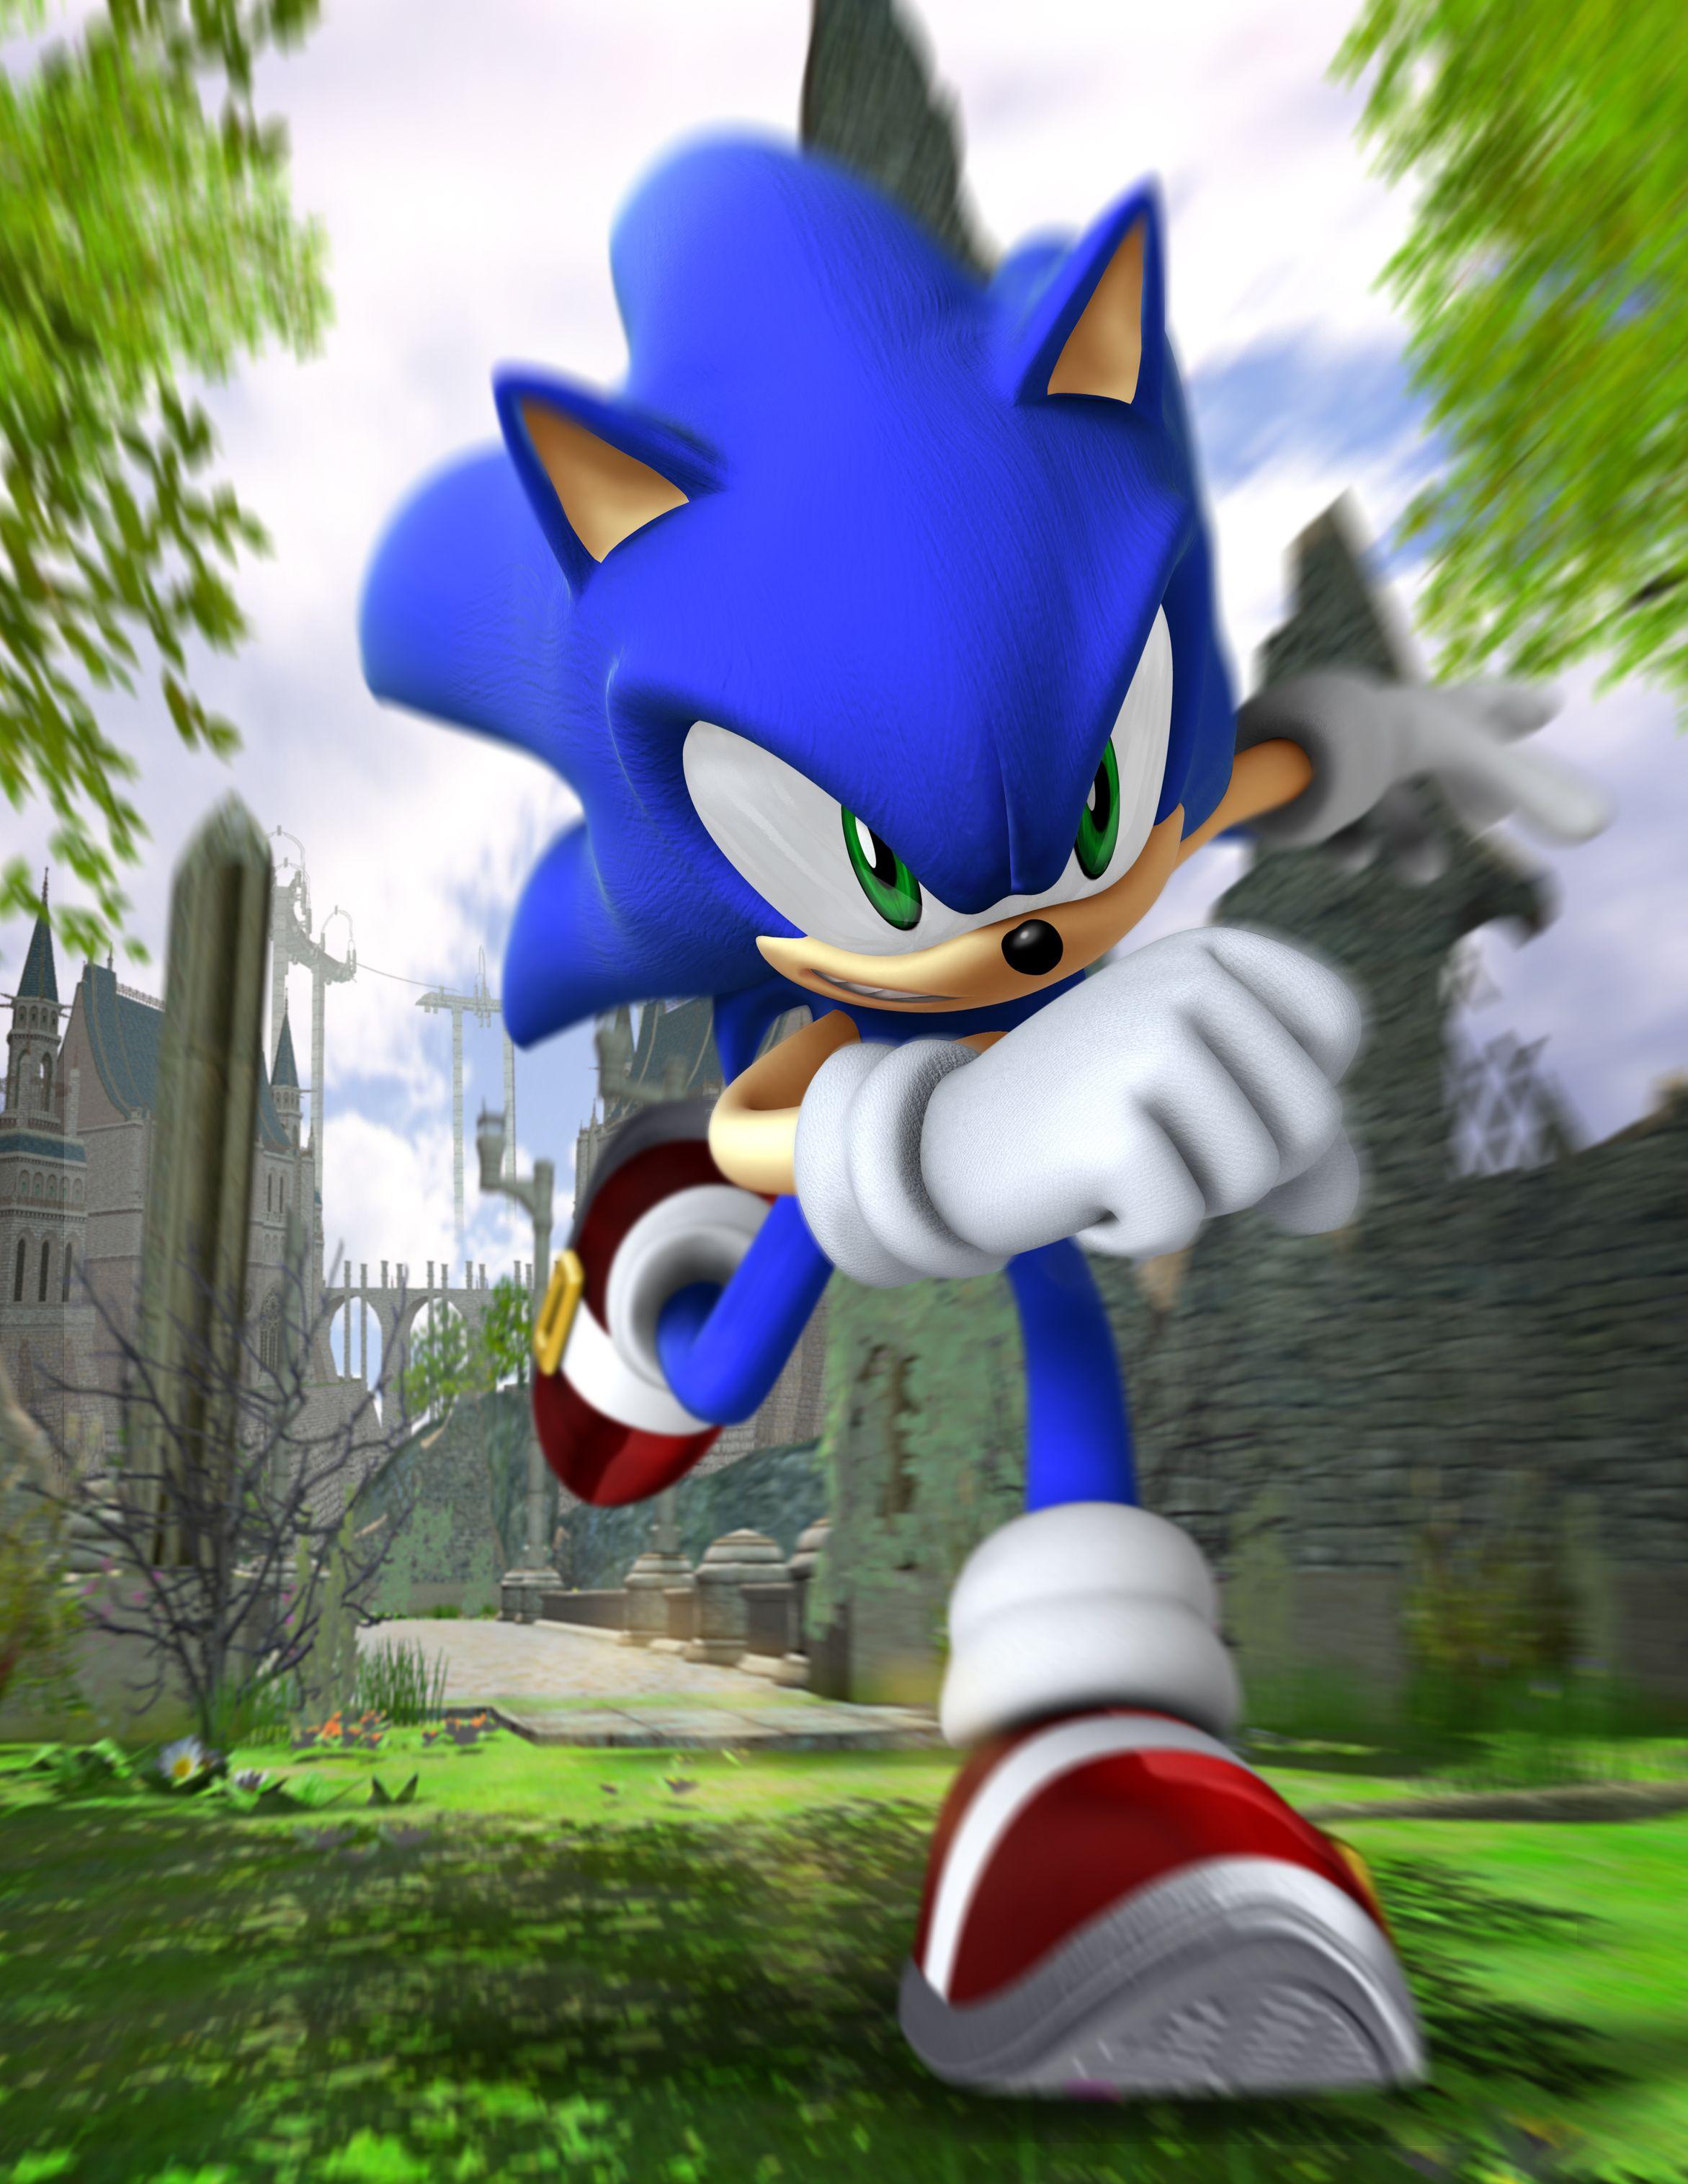 Sonic The Hedgehog 2006 Sonic The Hedgehog Sonic Hedgehog